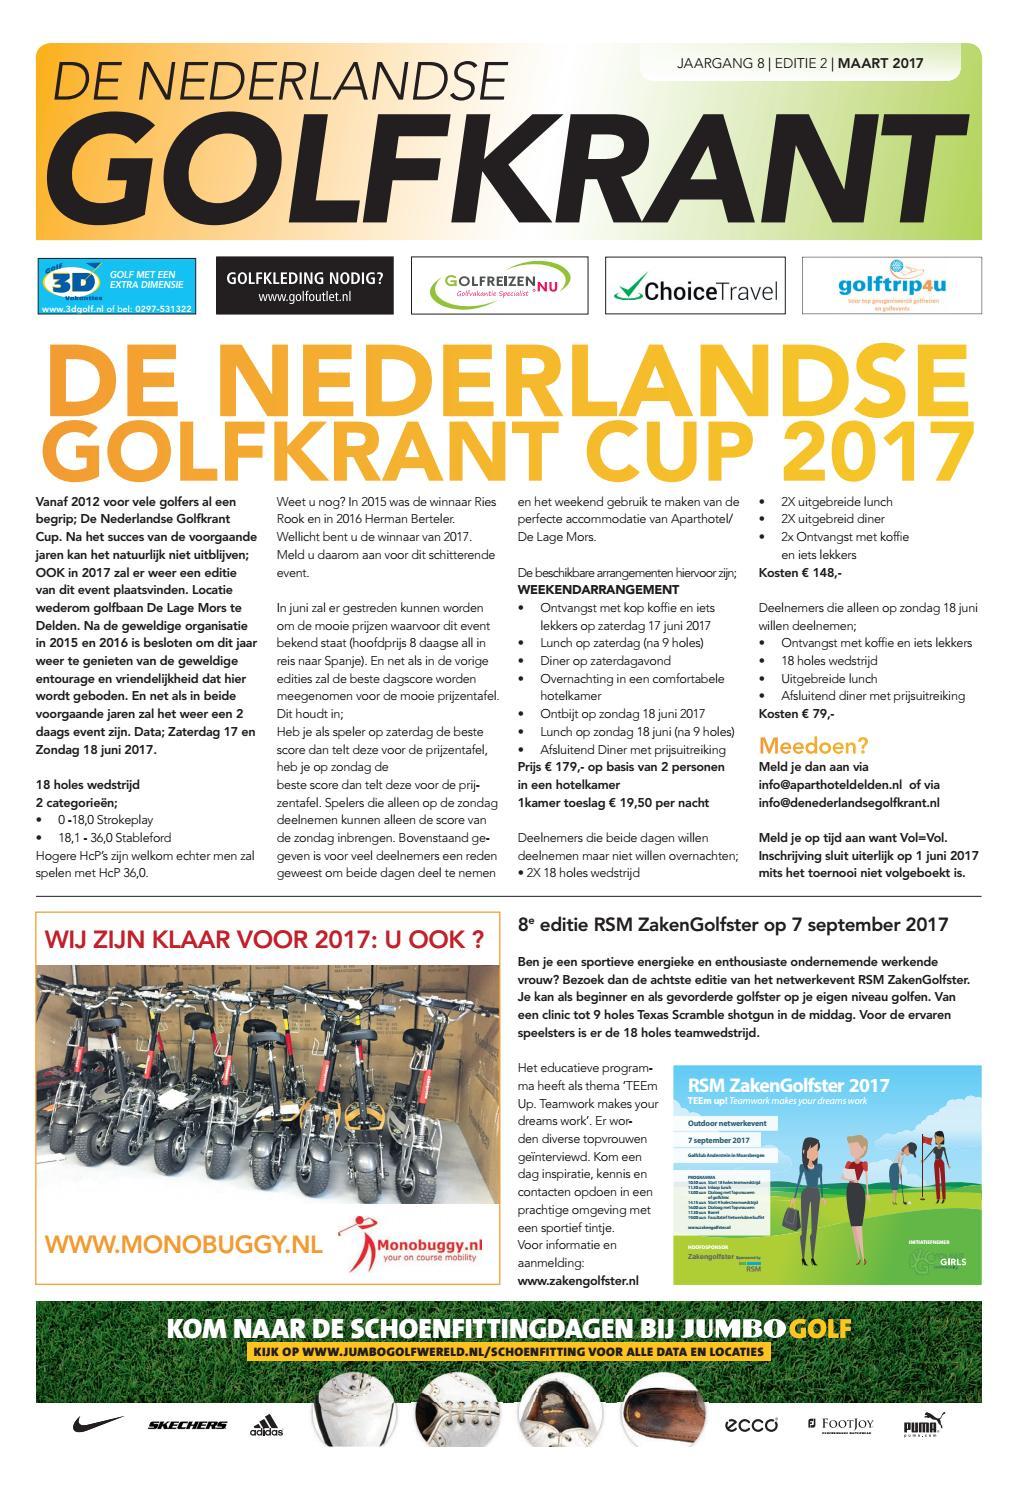 Golfkrant editie maart 2017 by Golfkrant - issuu 1b35a4425f